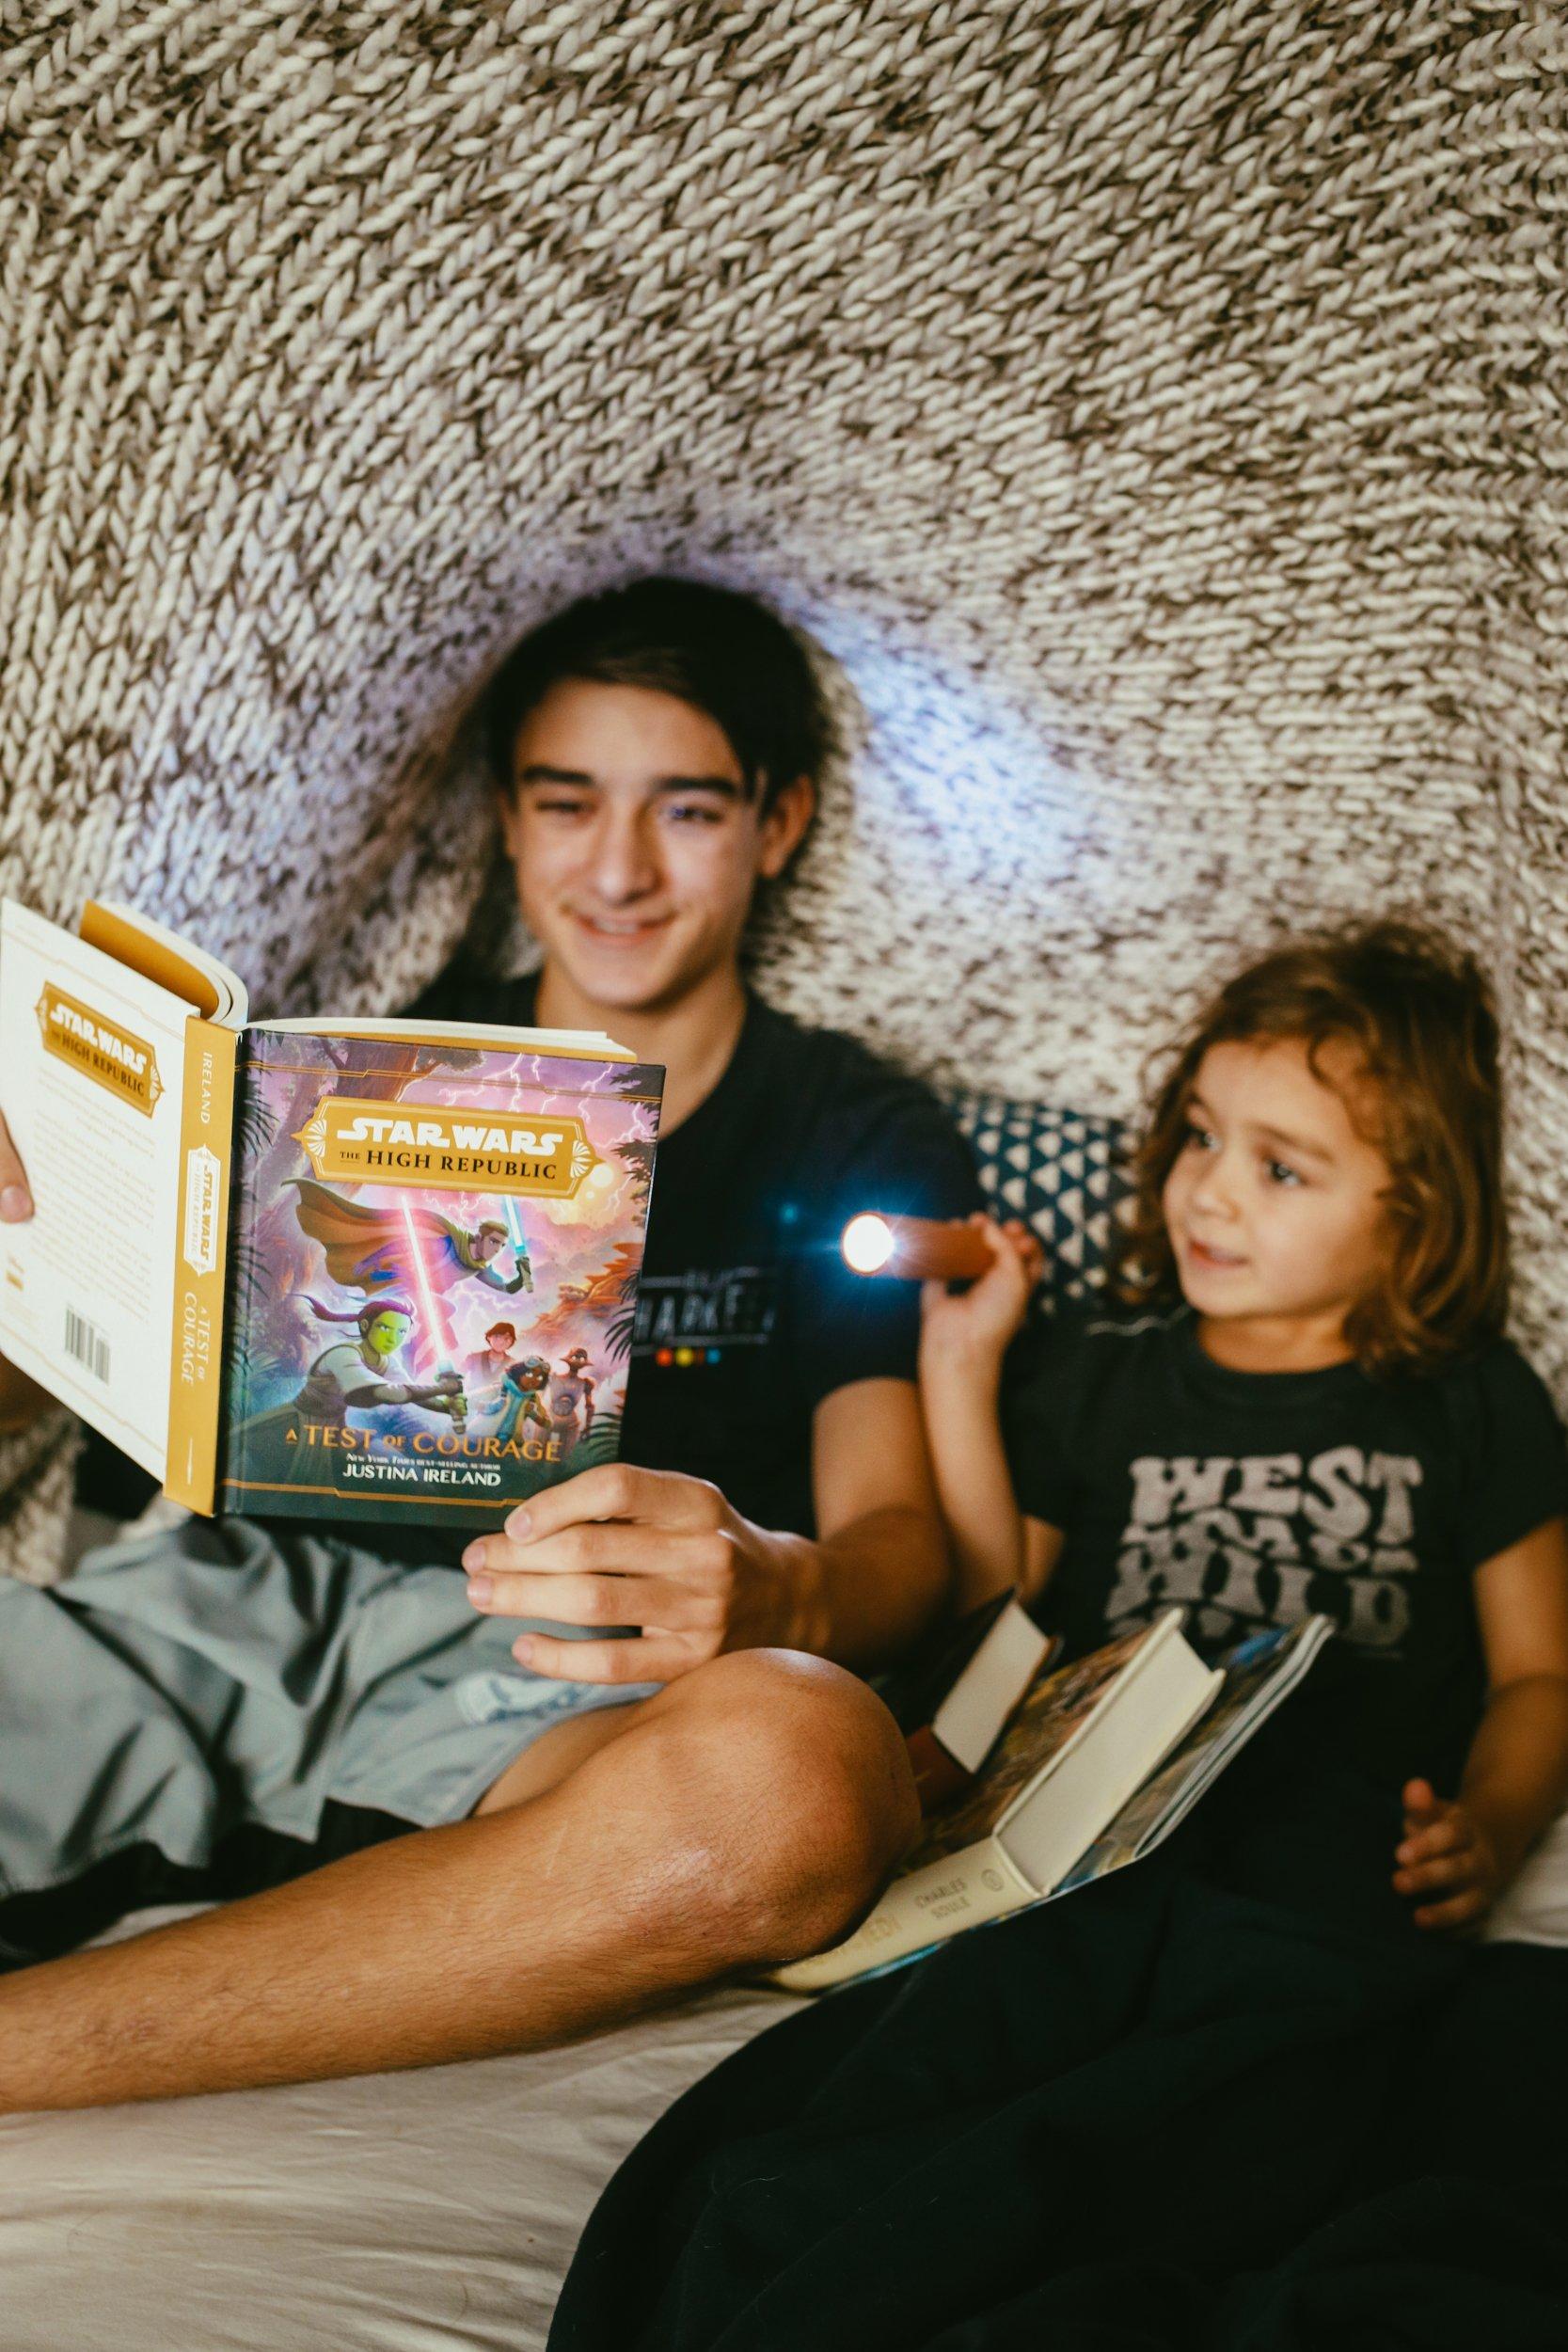 boys reading star wars